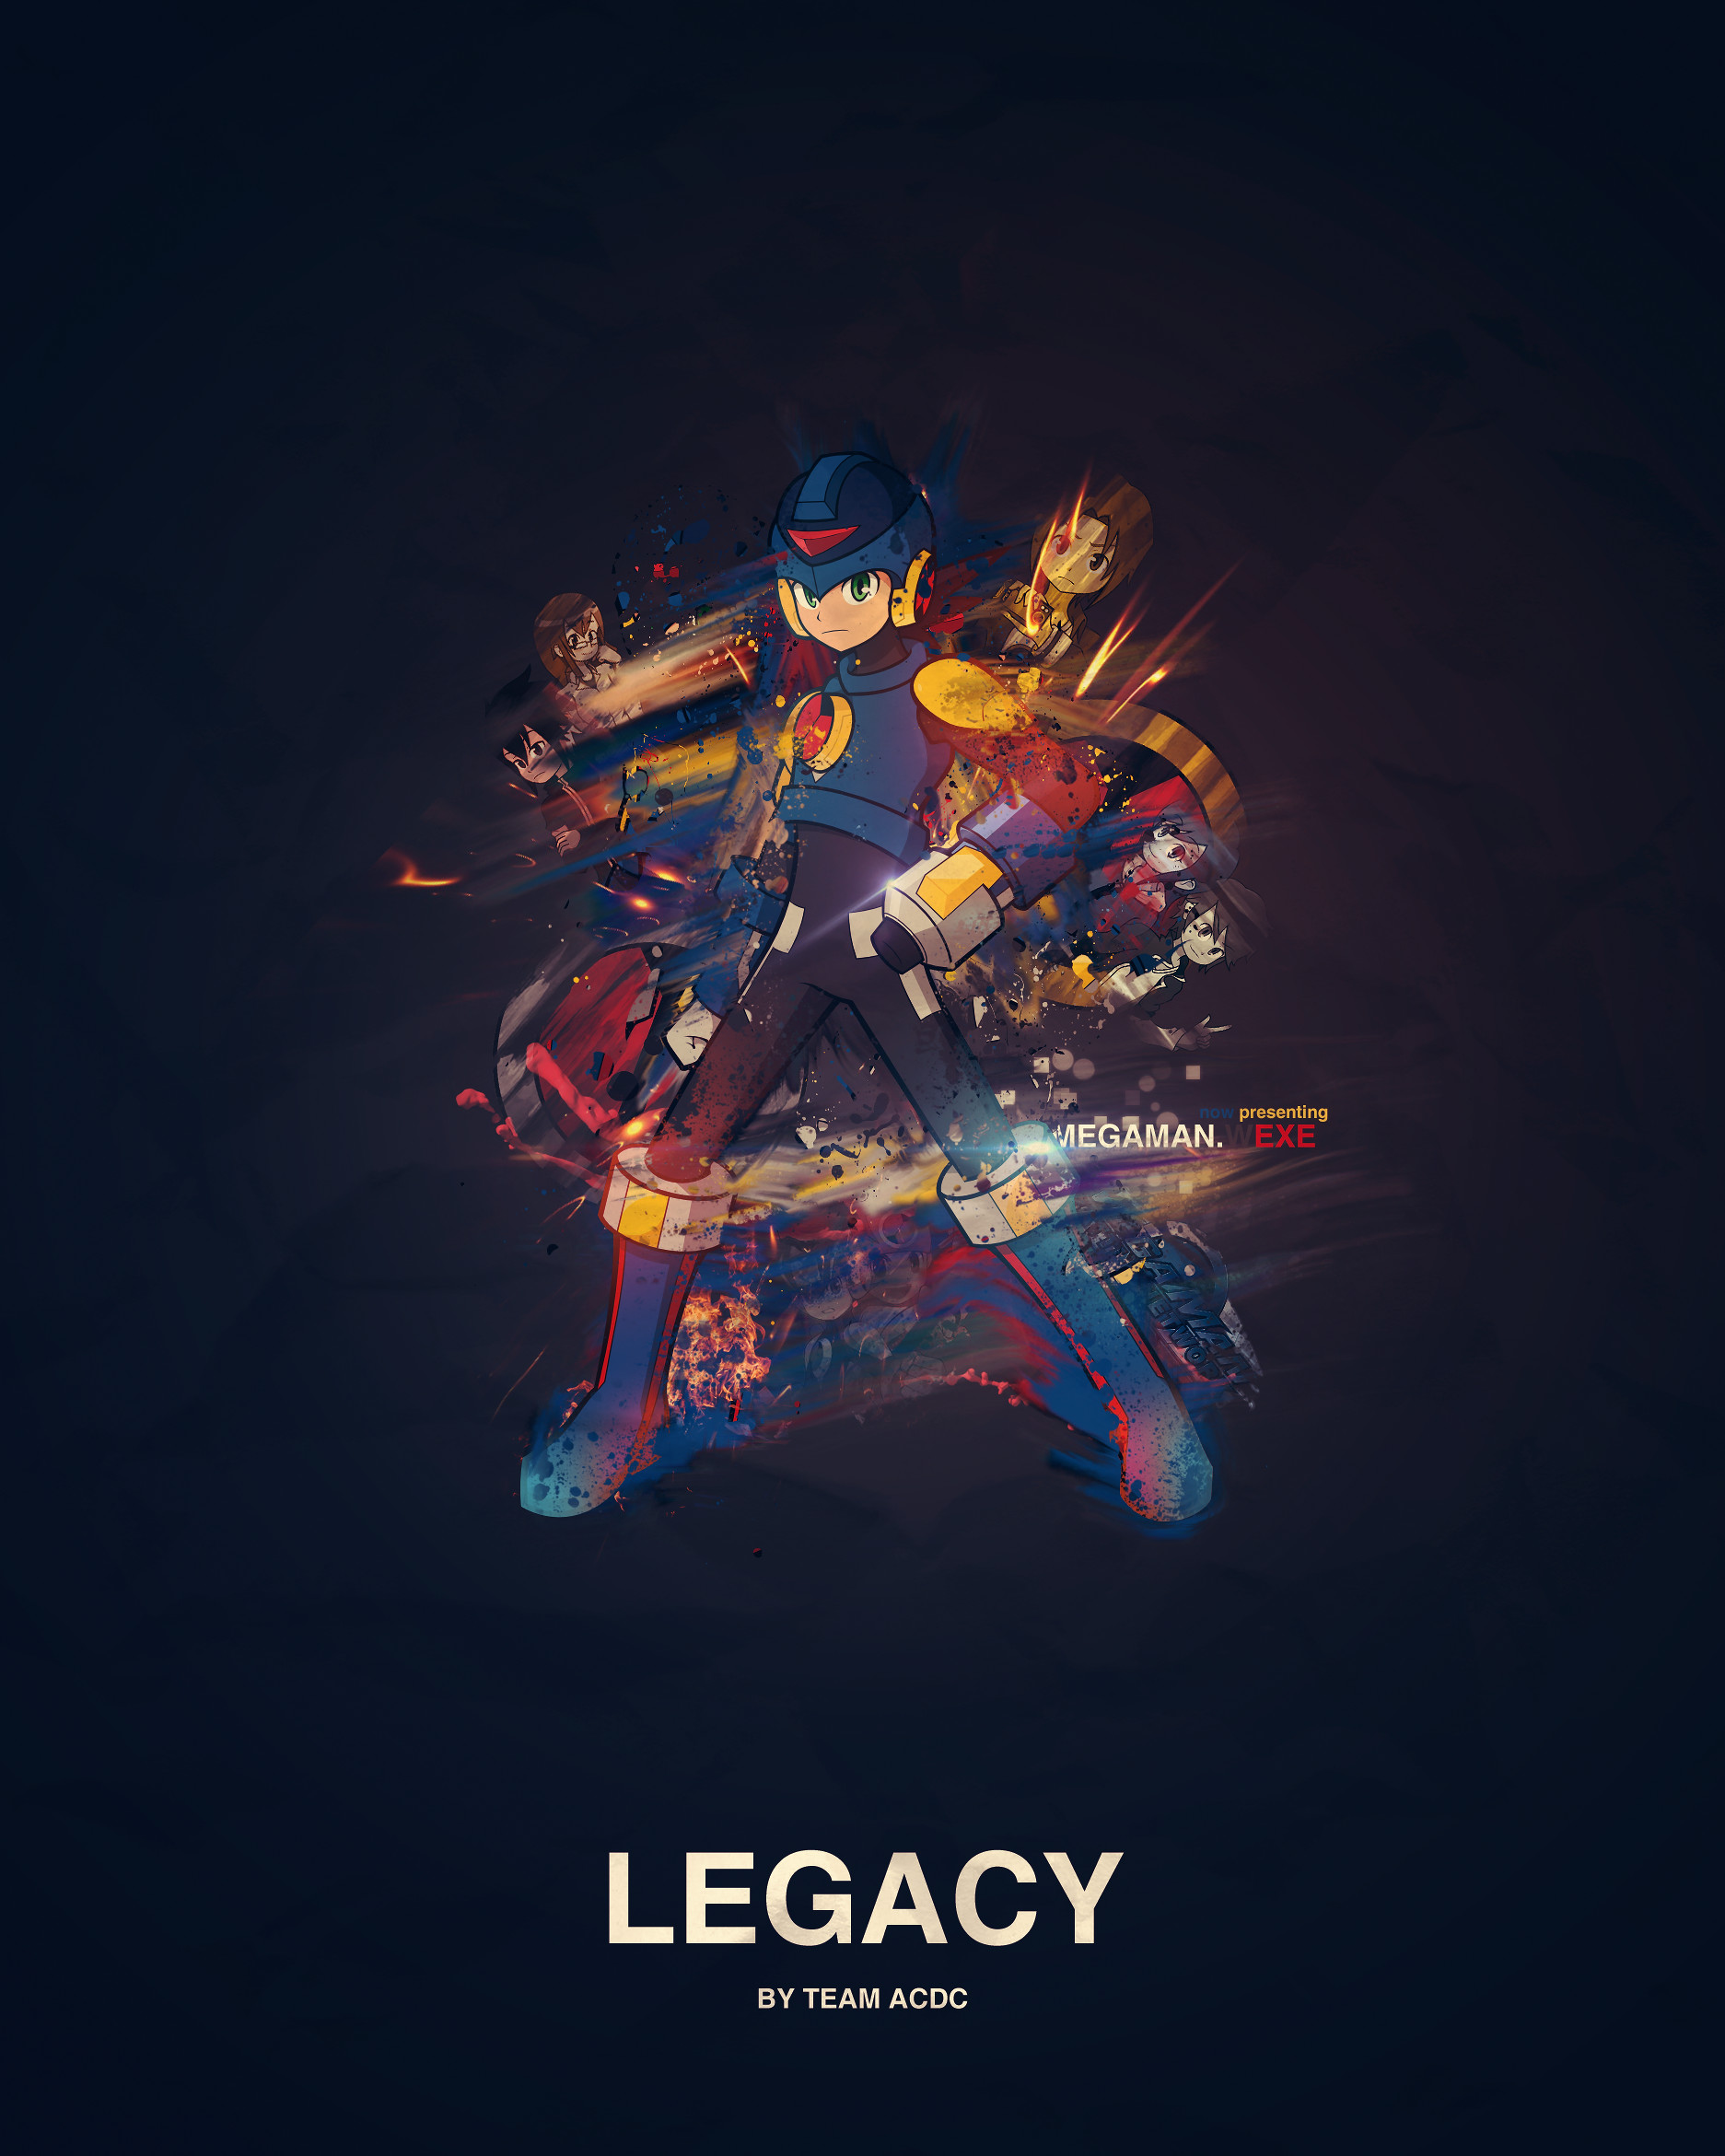 Megaman and Protoman Wallpaper – WallpaperSafari